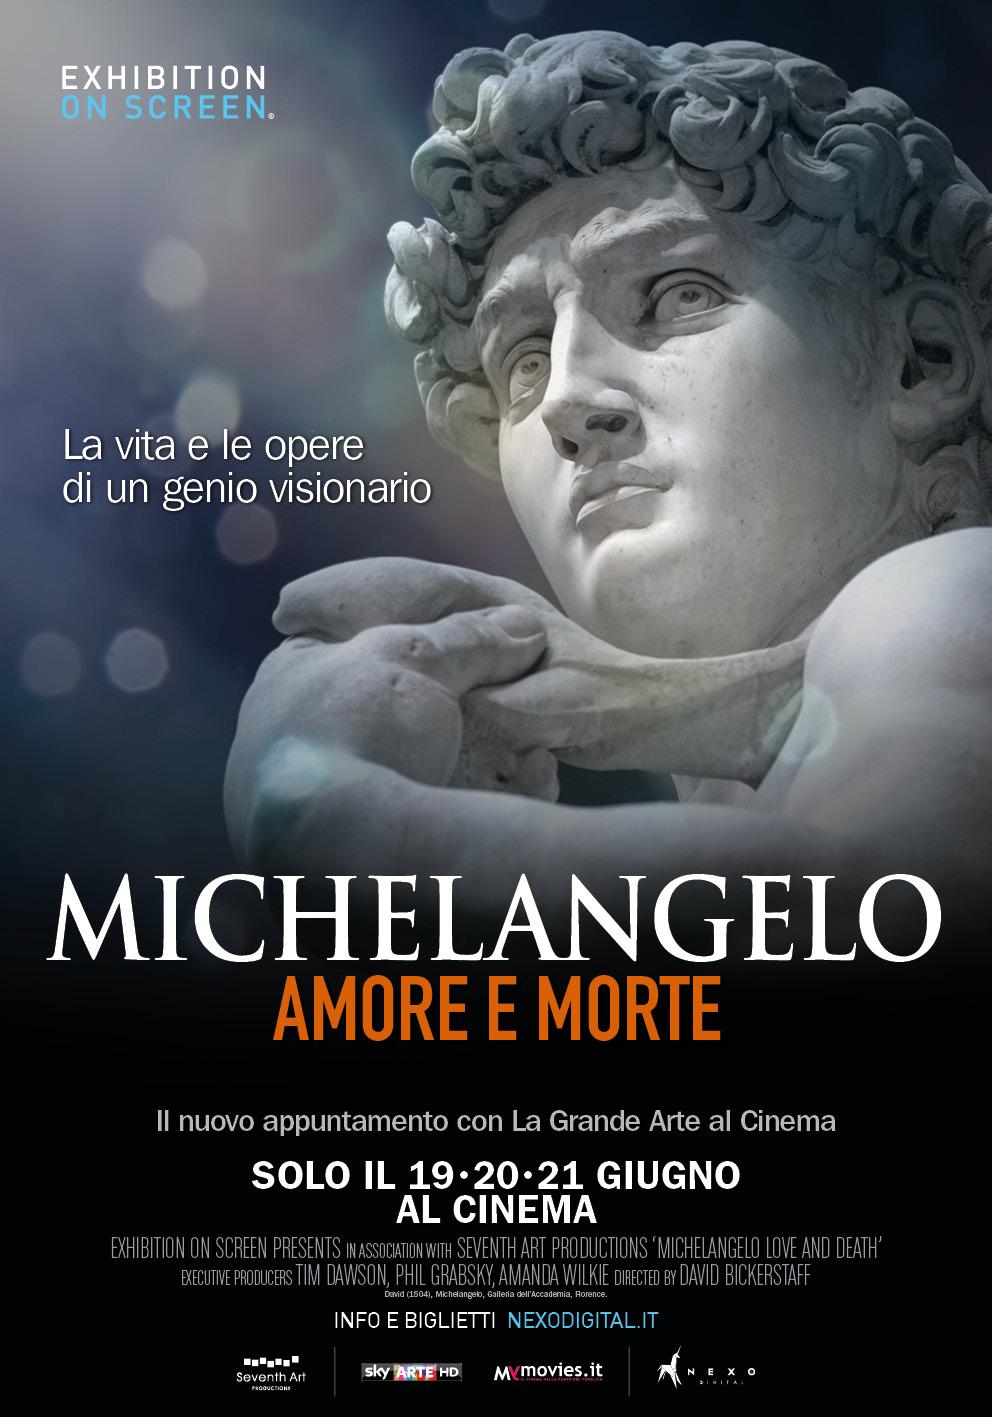 Michelangelo_POSTER_100x140